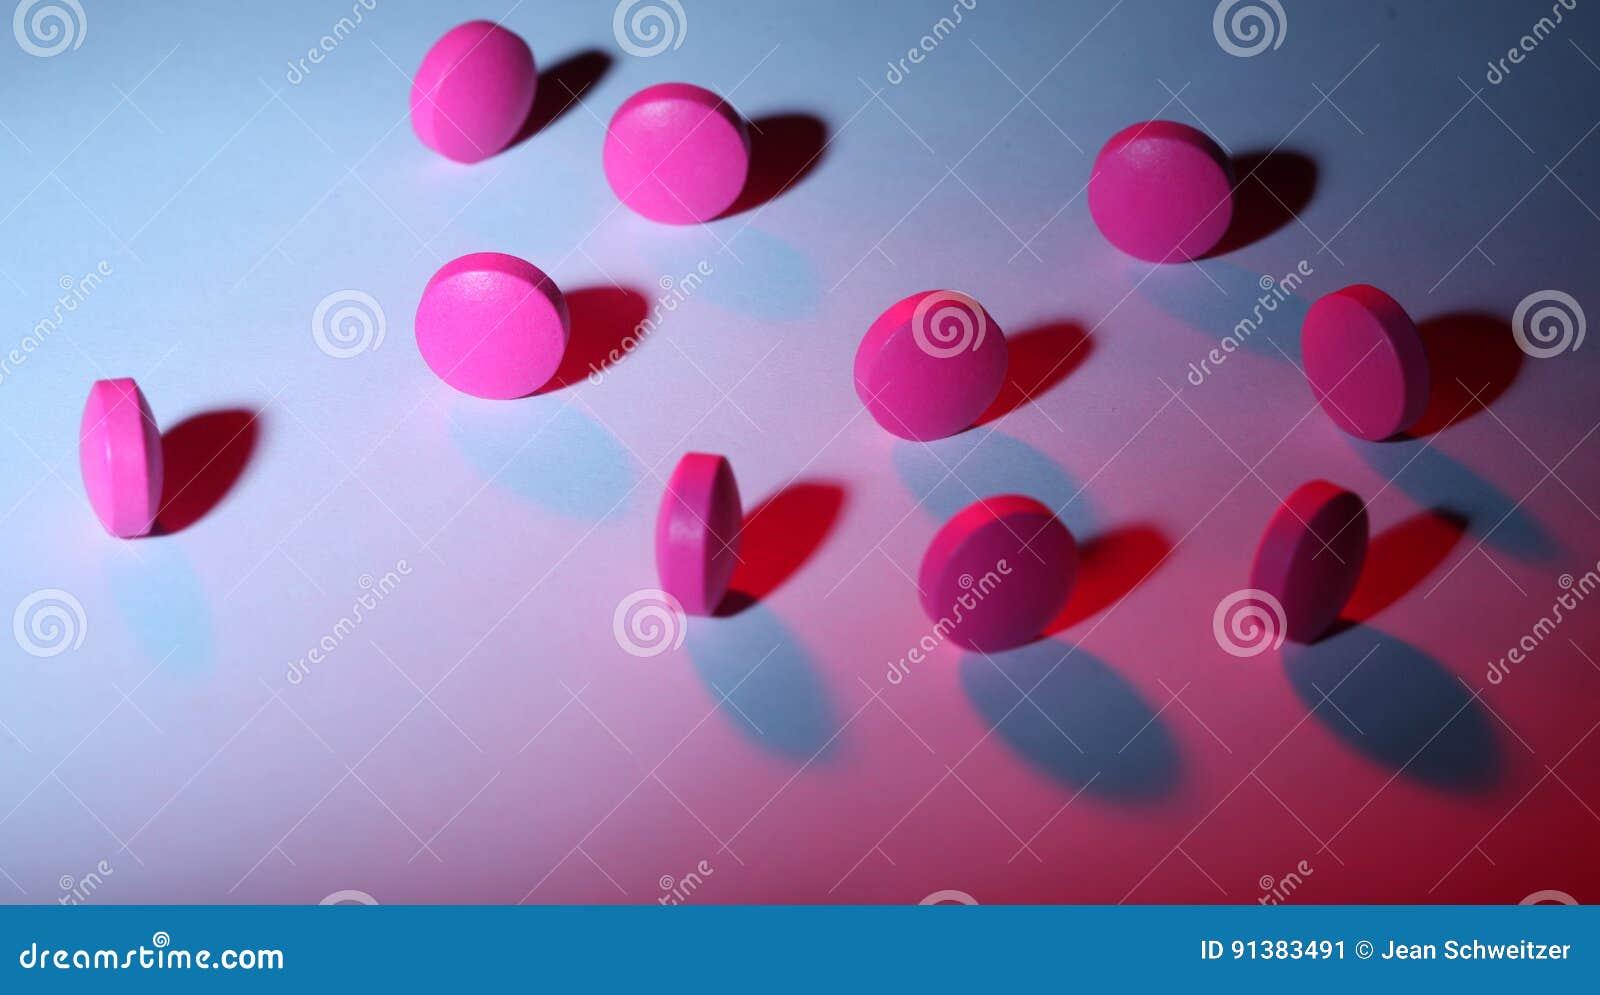 pink and purple pills stock image image of light pill 91383491